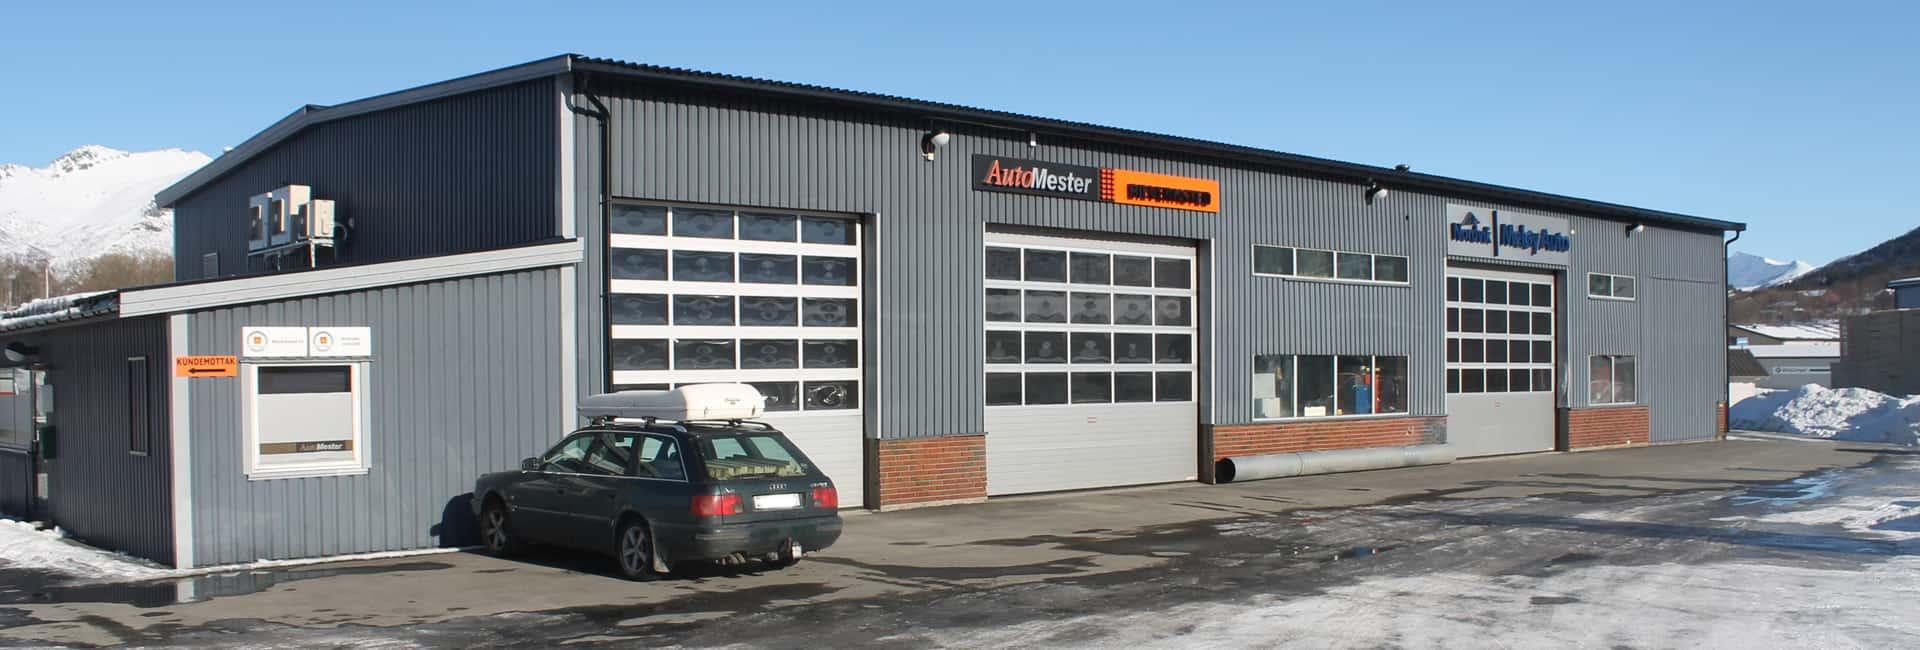 Bilde av fasaden til bilverkstedet Nordvik på Halsa